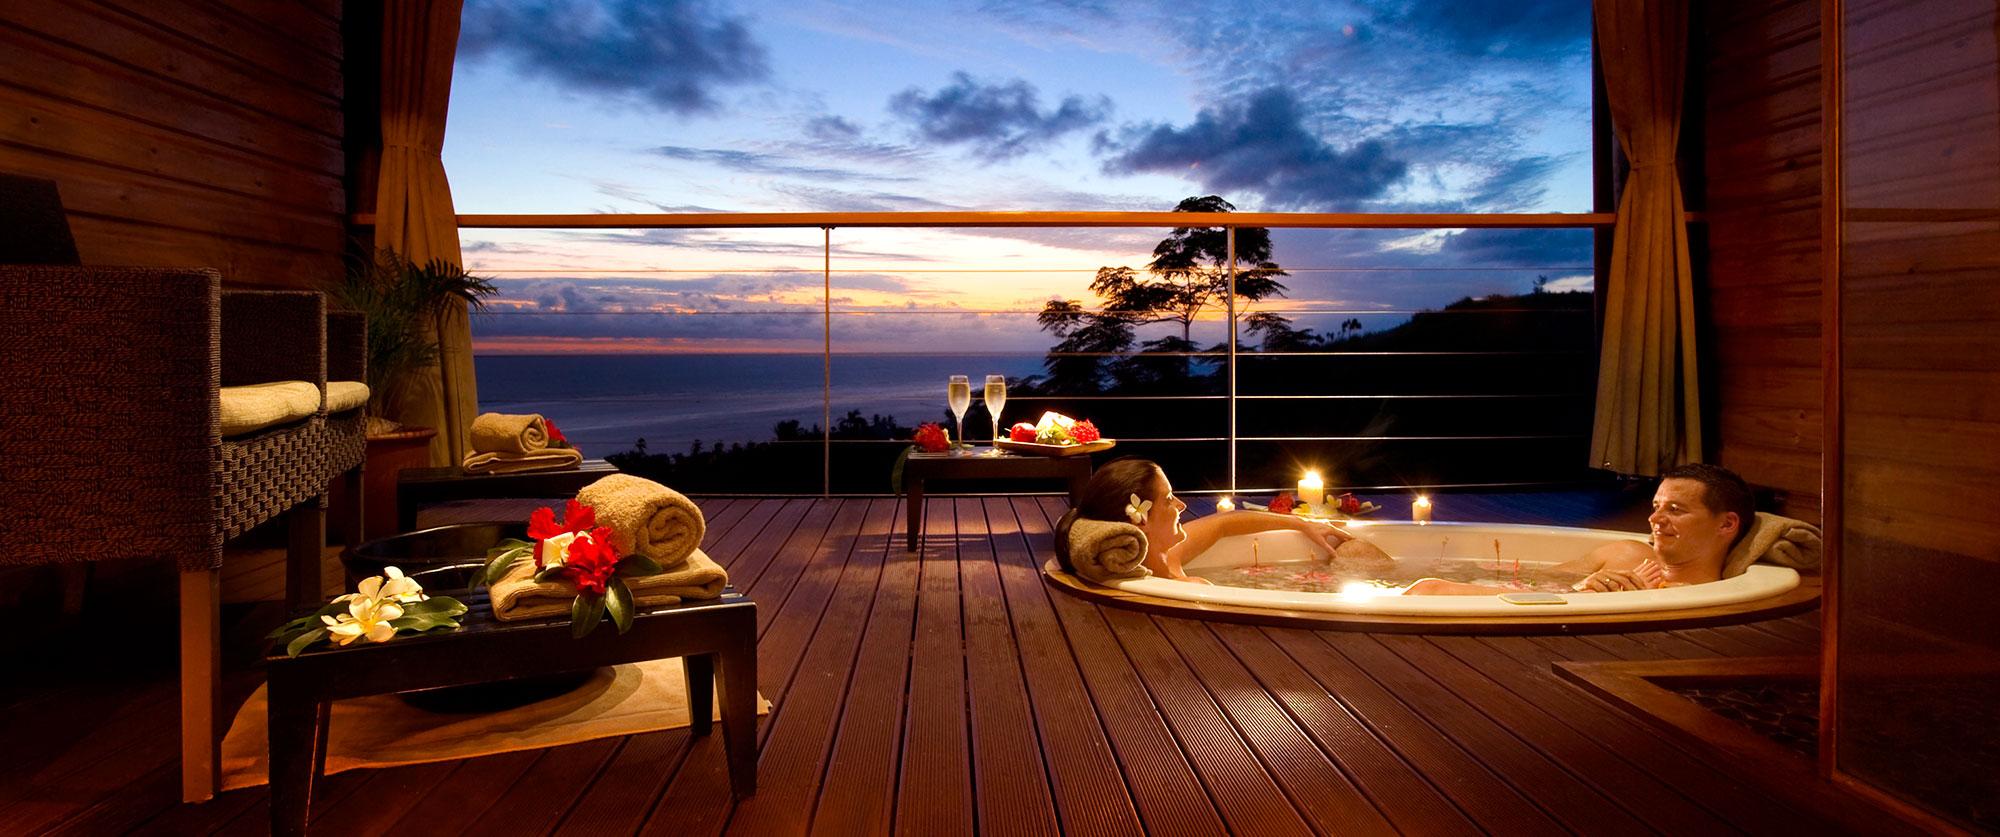 Fiji Honeymoon Package - Outrigger Bebe Spa